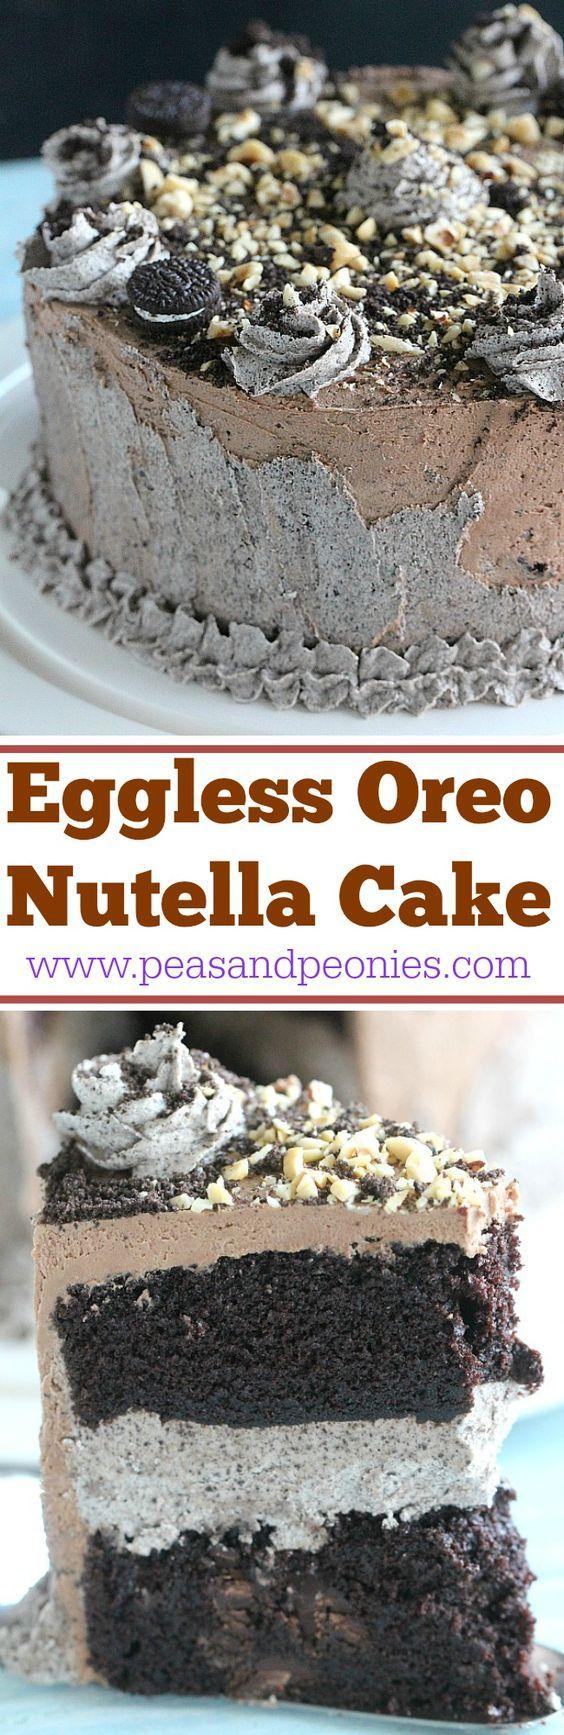 Oreo Nutella Cake - Eggless Chocolate Cake - Peas and Peonies